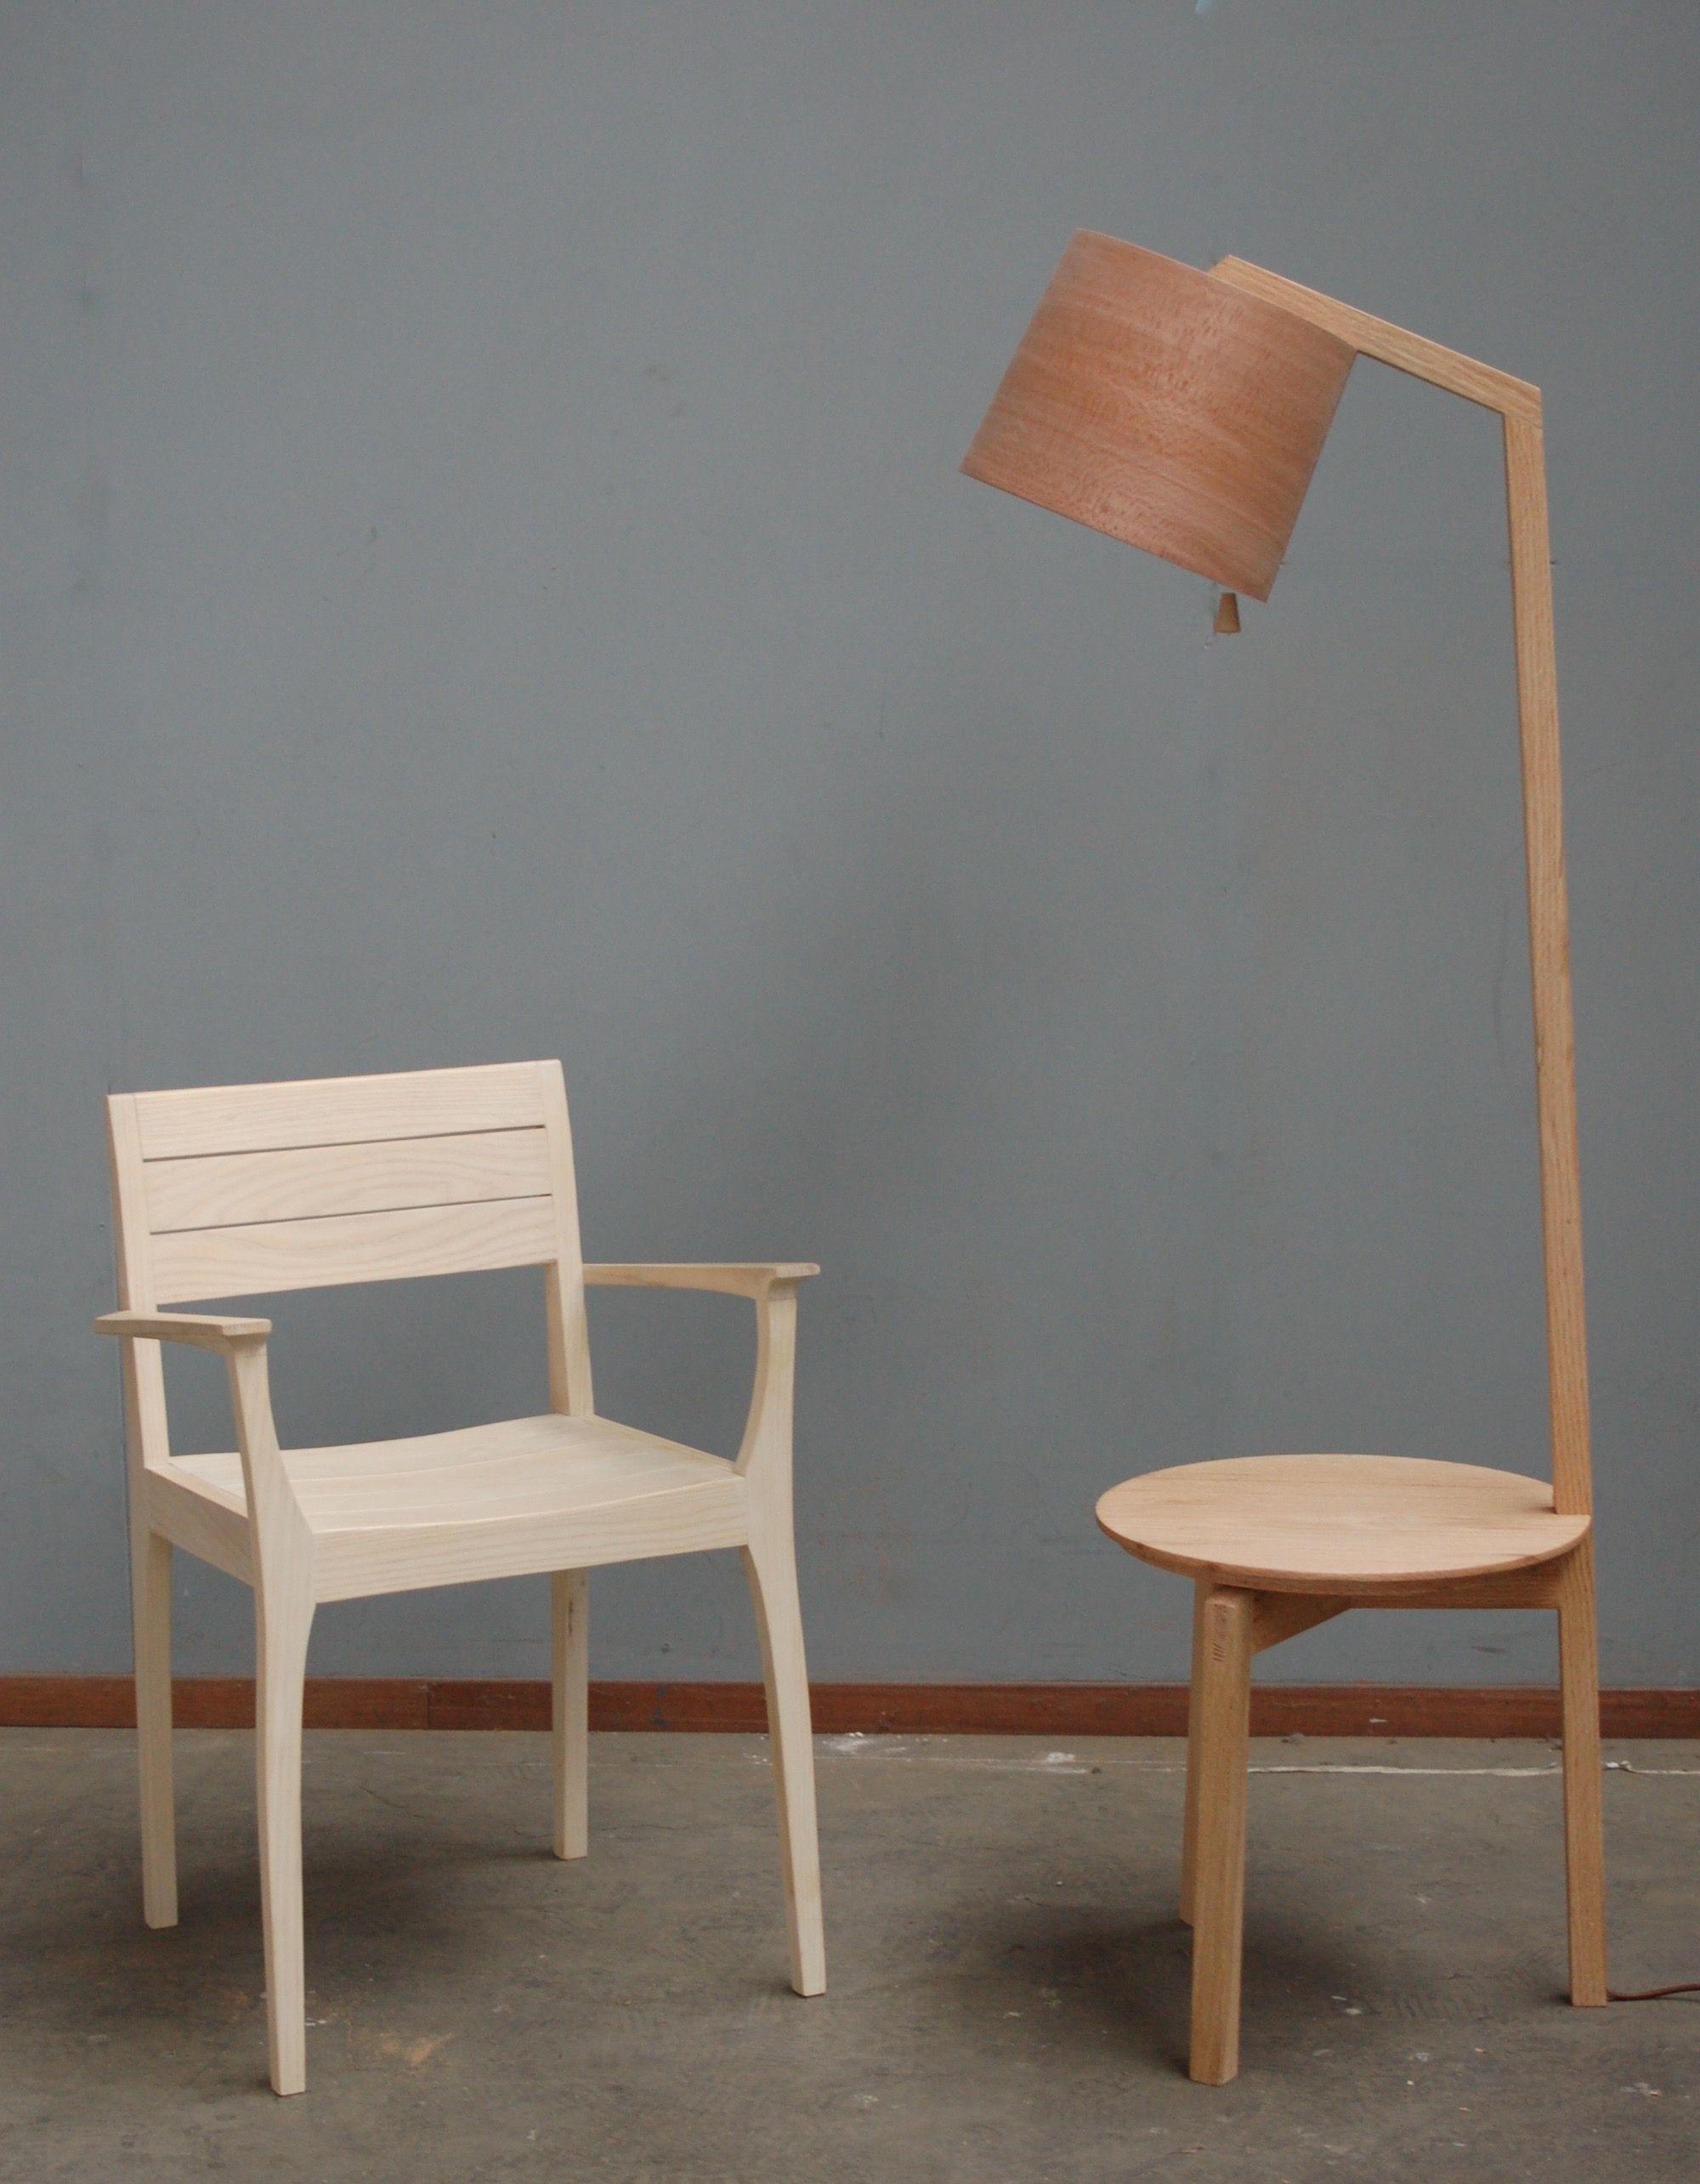 Leeslamp Met Tafeltje.Pin Op Lees Lamp Tafel